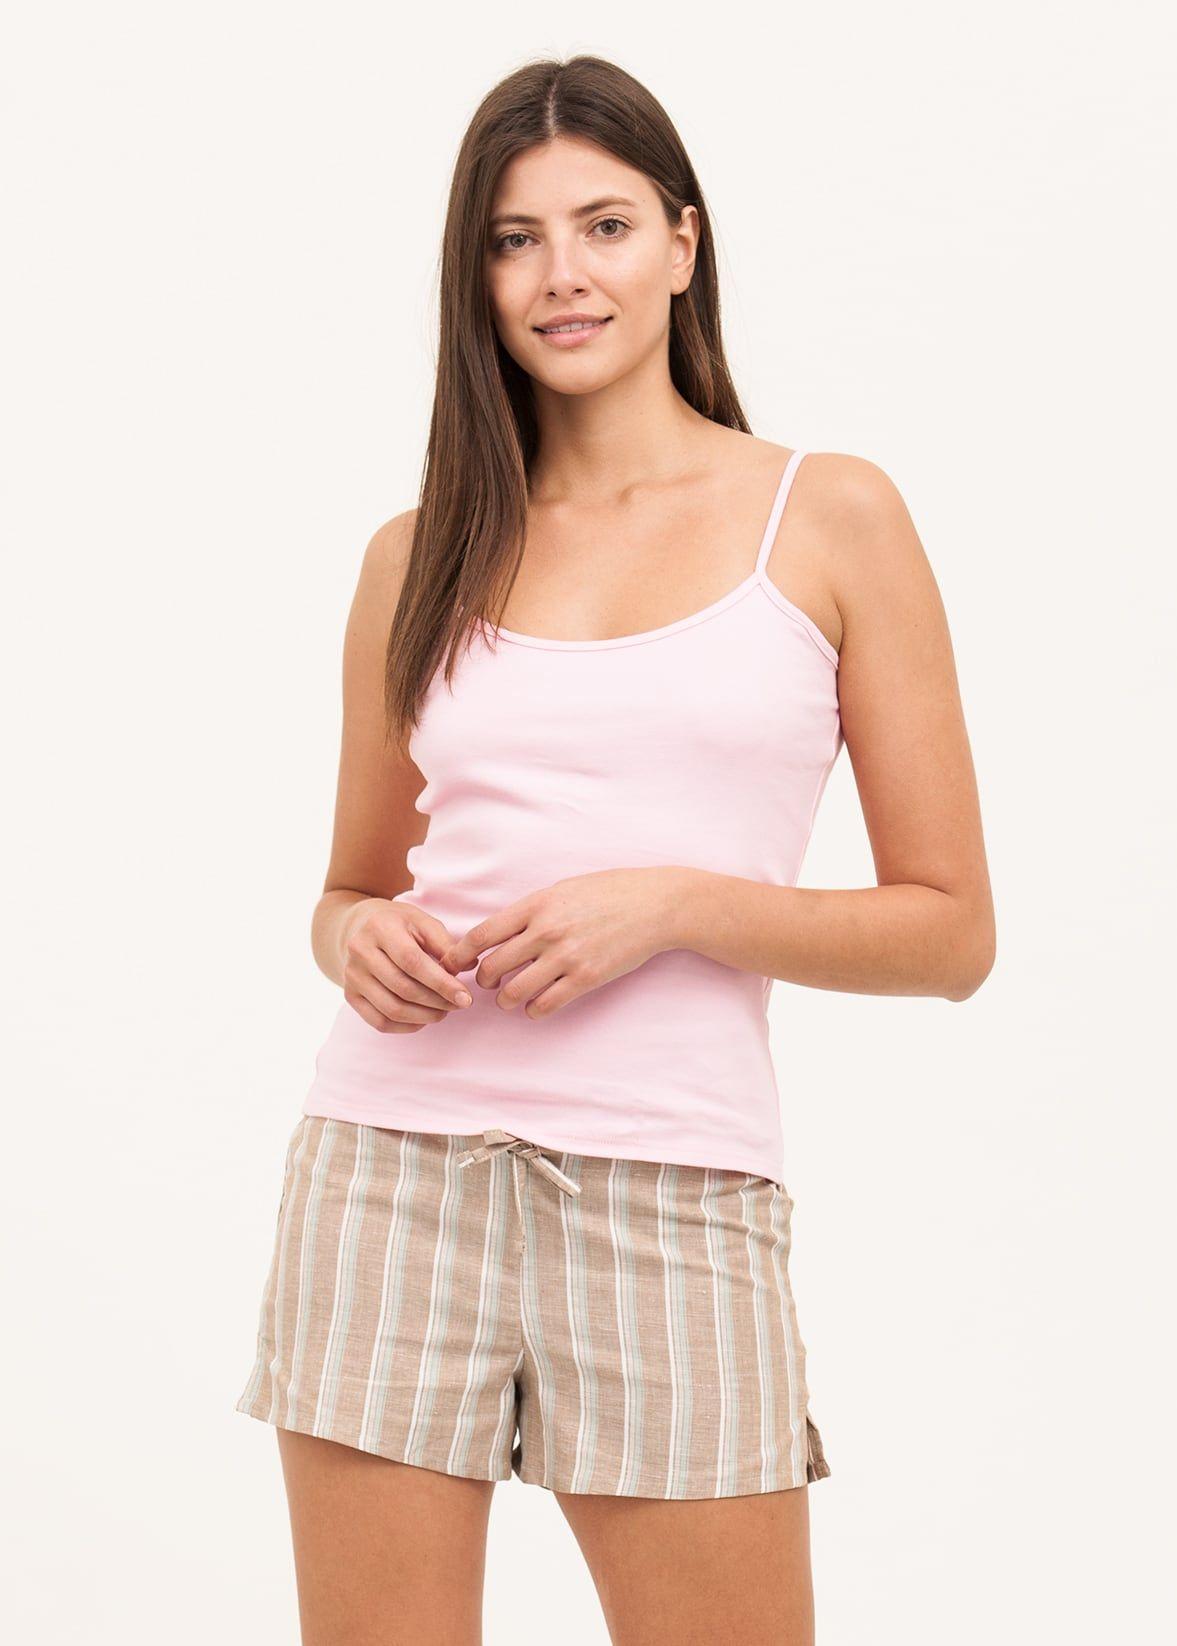 Linen Pyjama Shorts for Women  c239fbf3a2